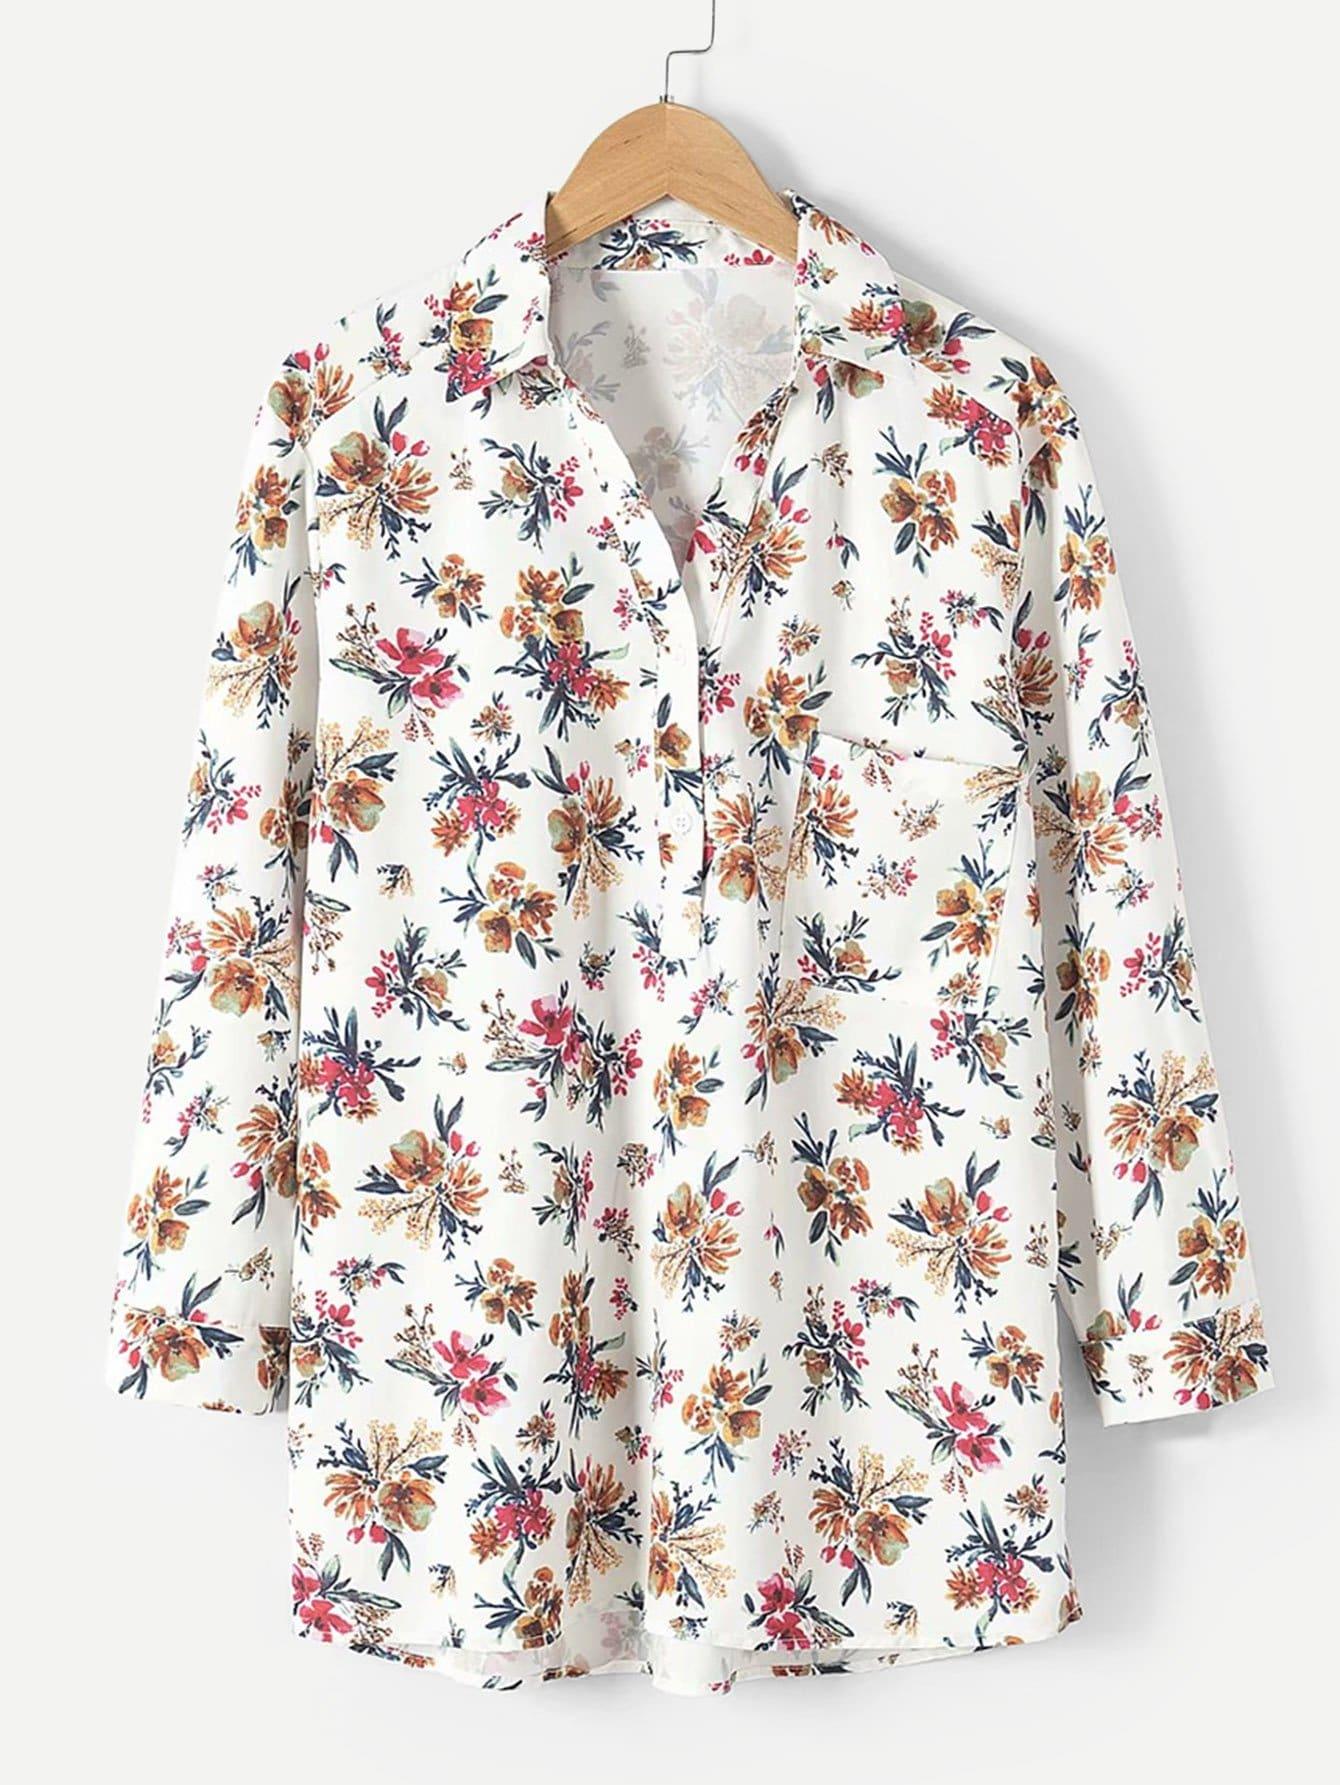 Купить Общая ситцевая рубашка, null, SheIn